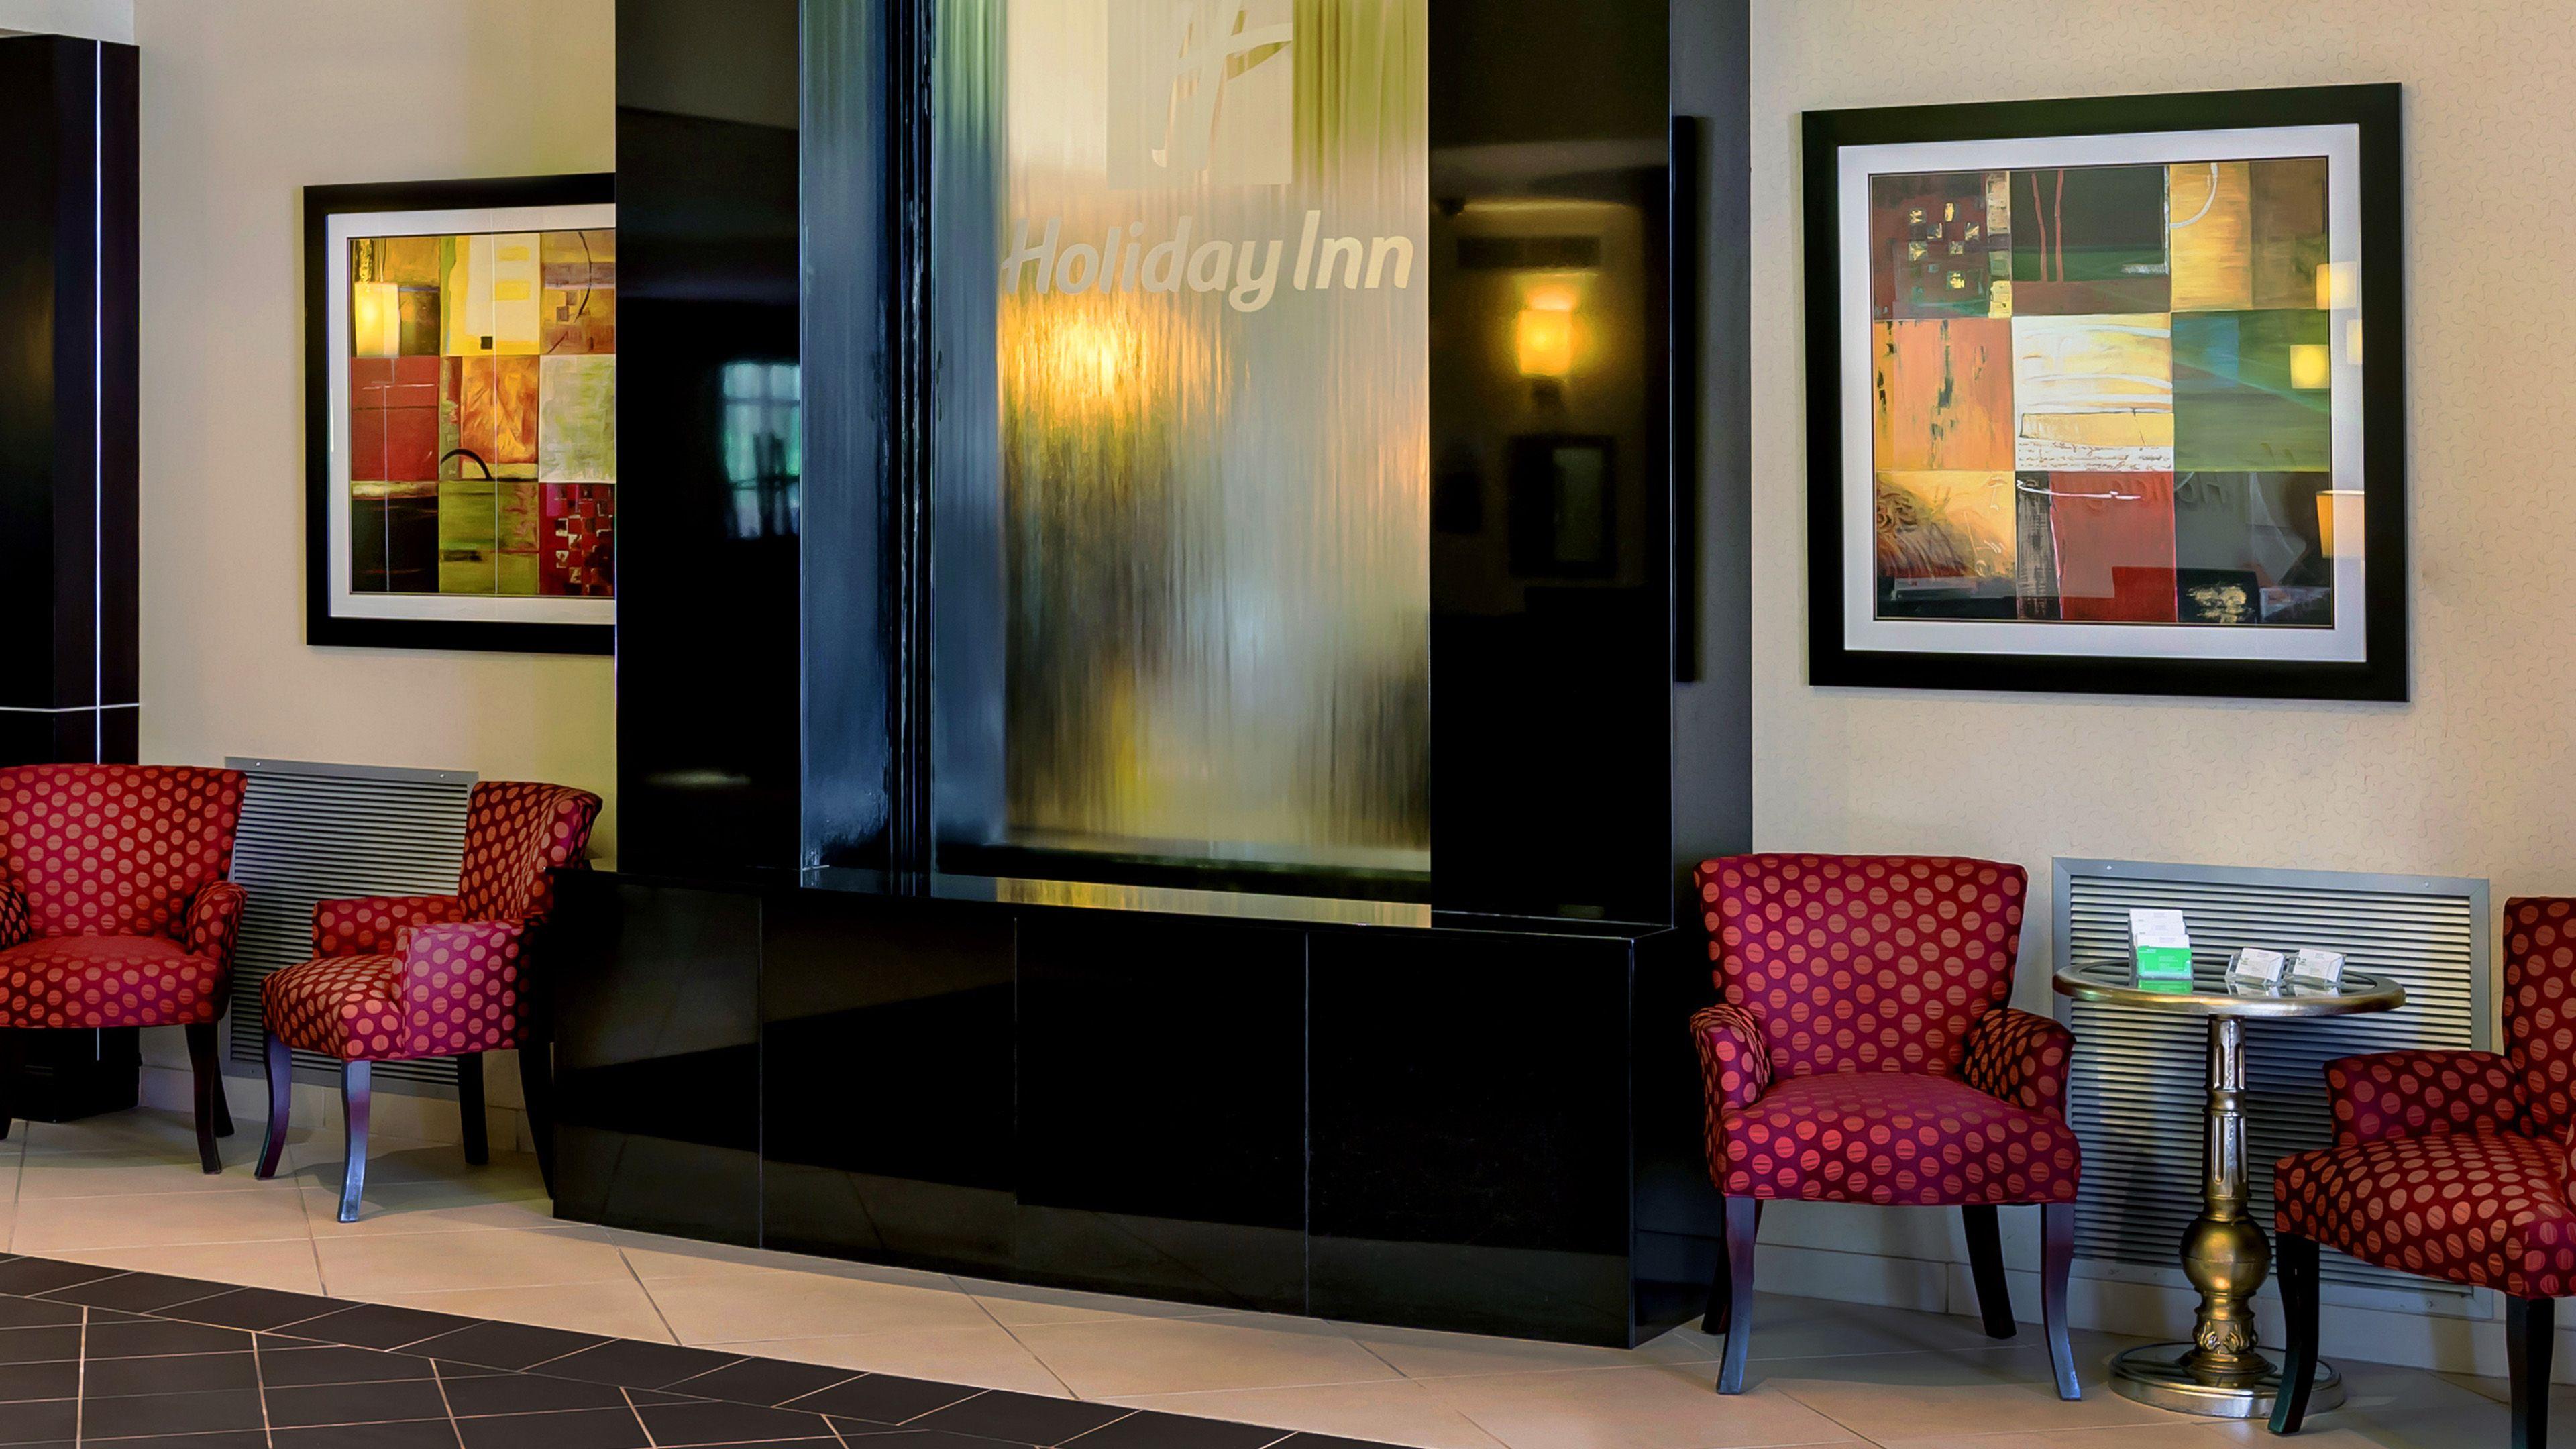 Holiday Inn Oklahoma City Airport image 4